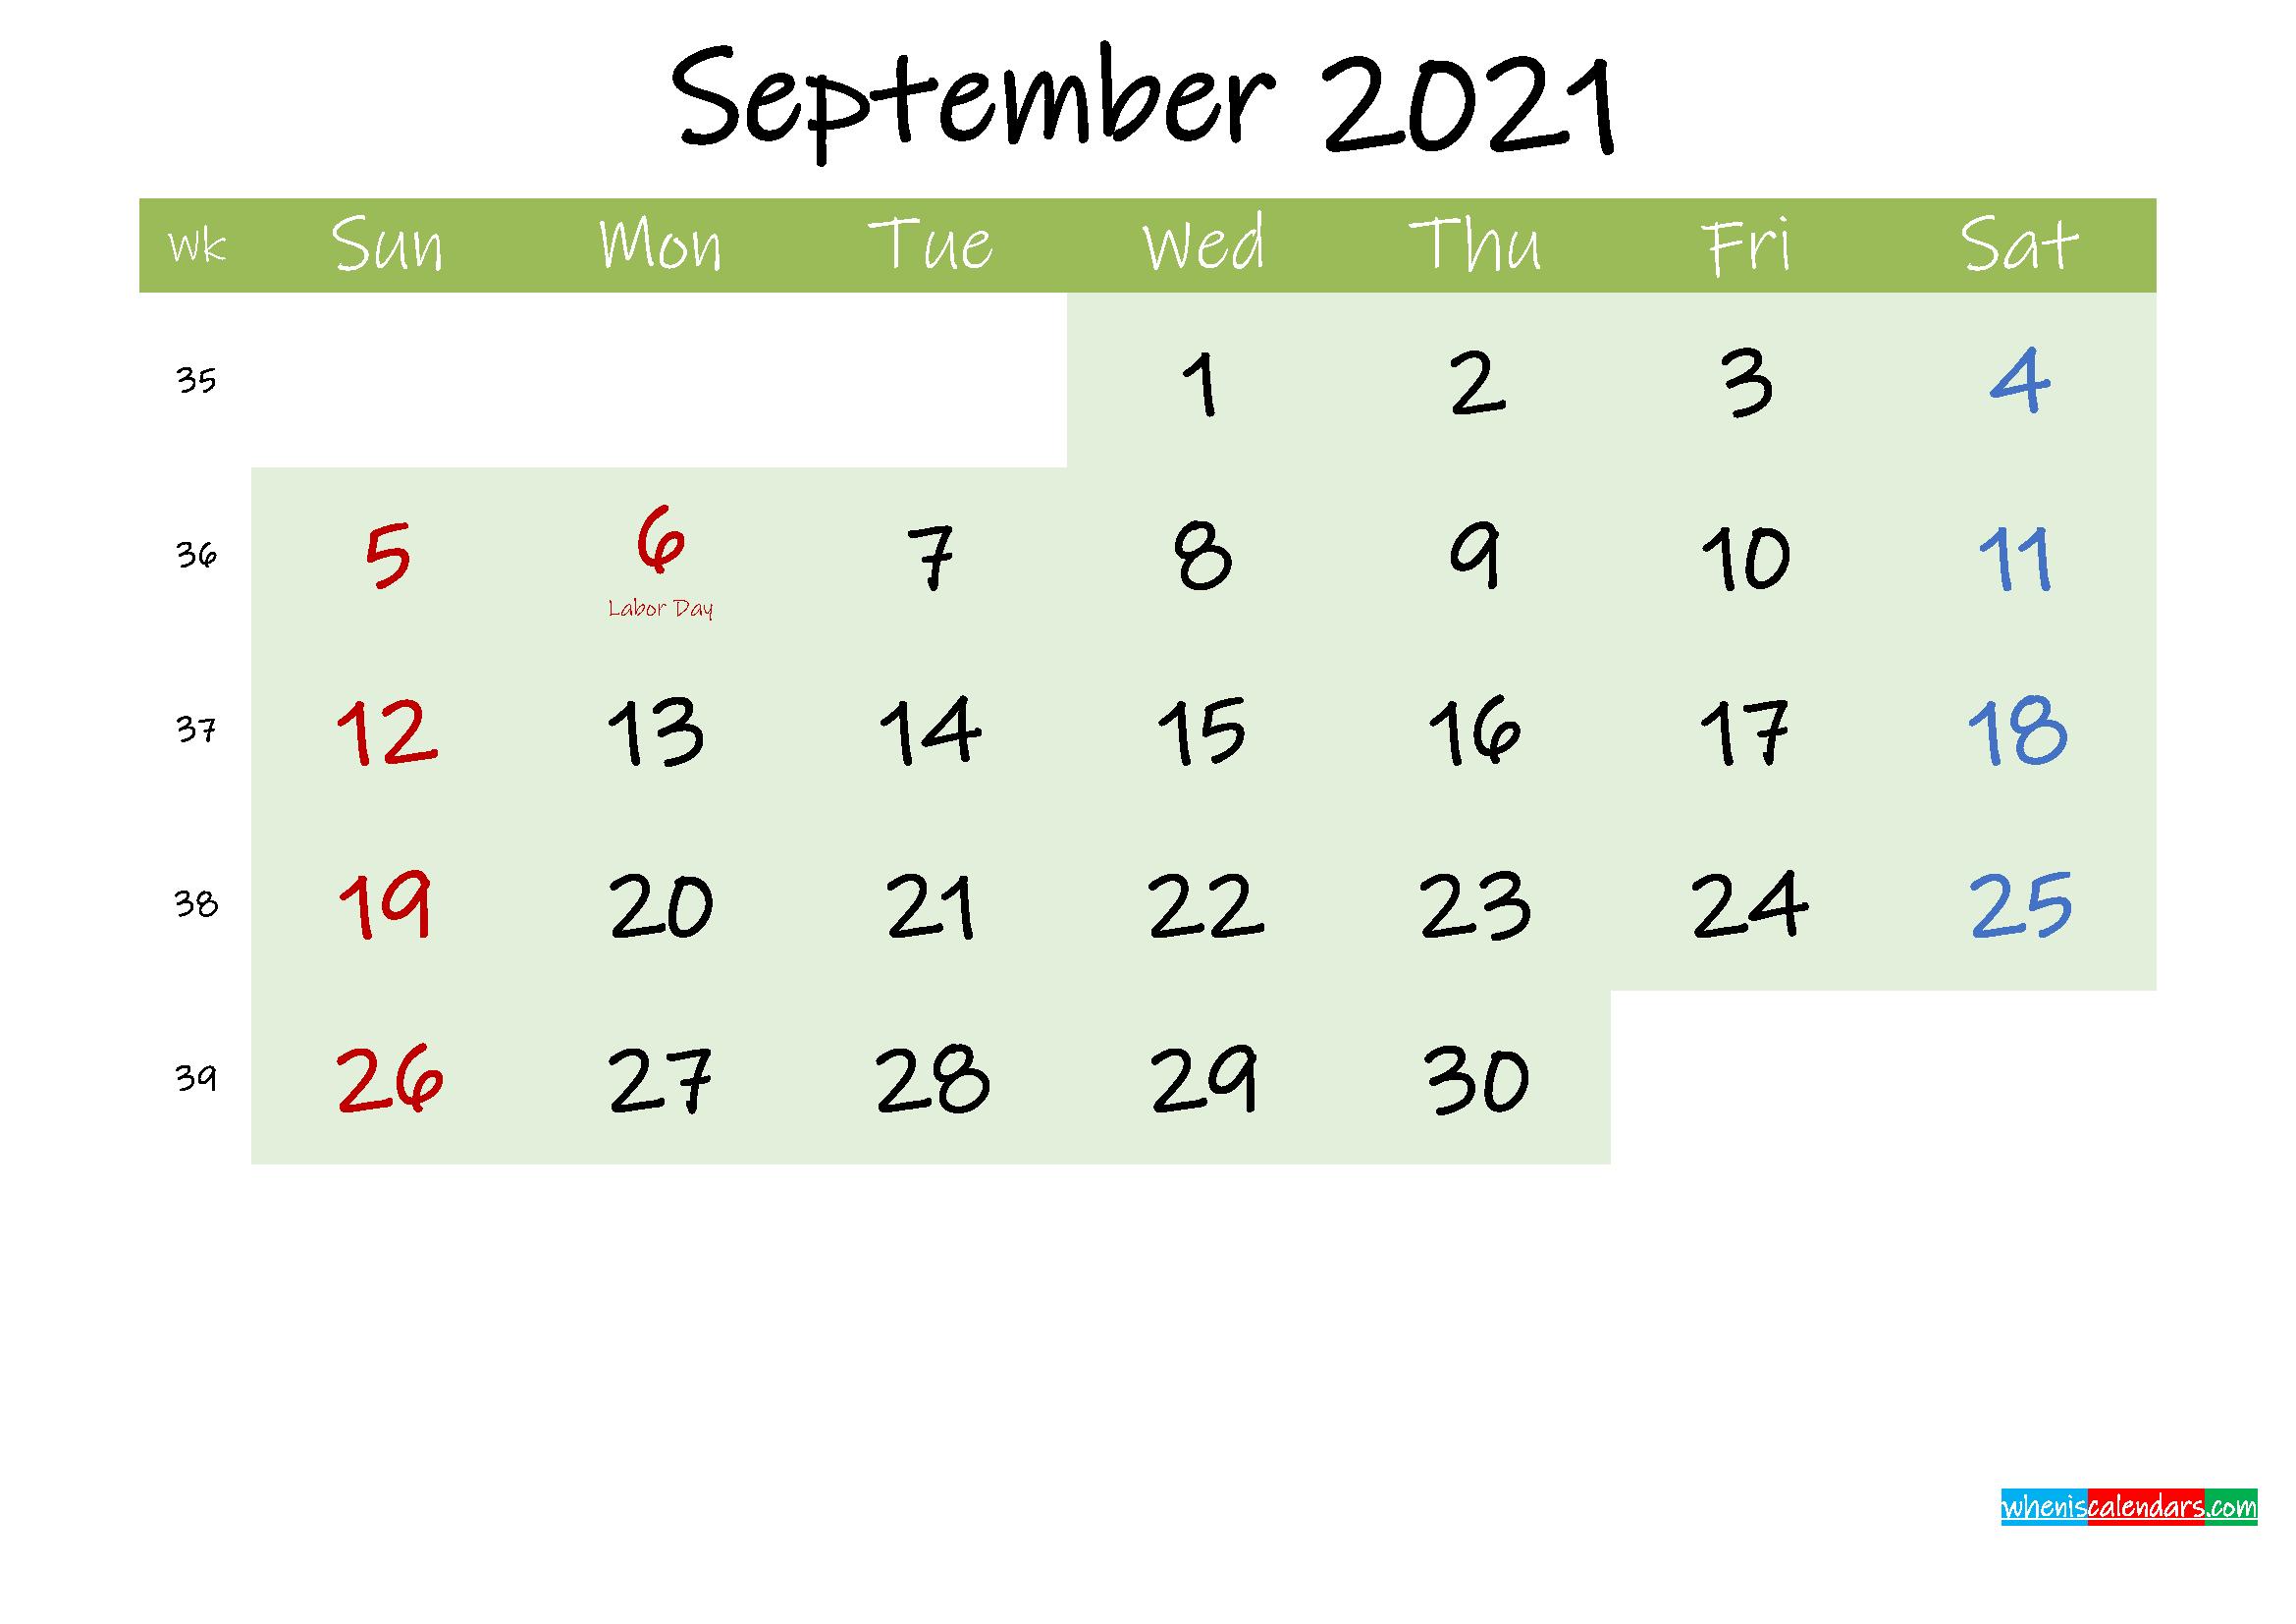 September 2021 Calendar with Holidays Printable